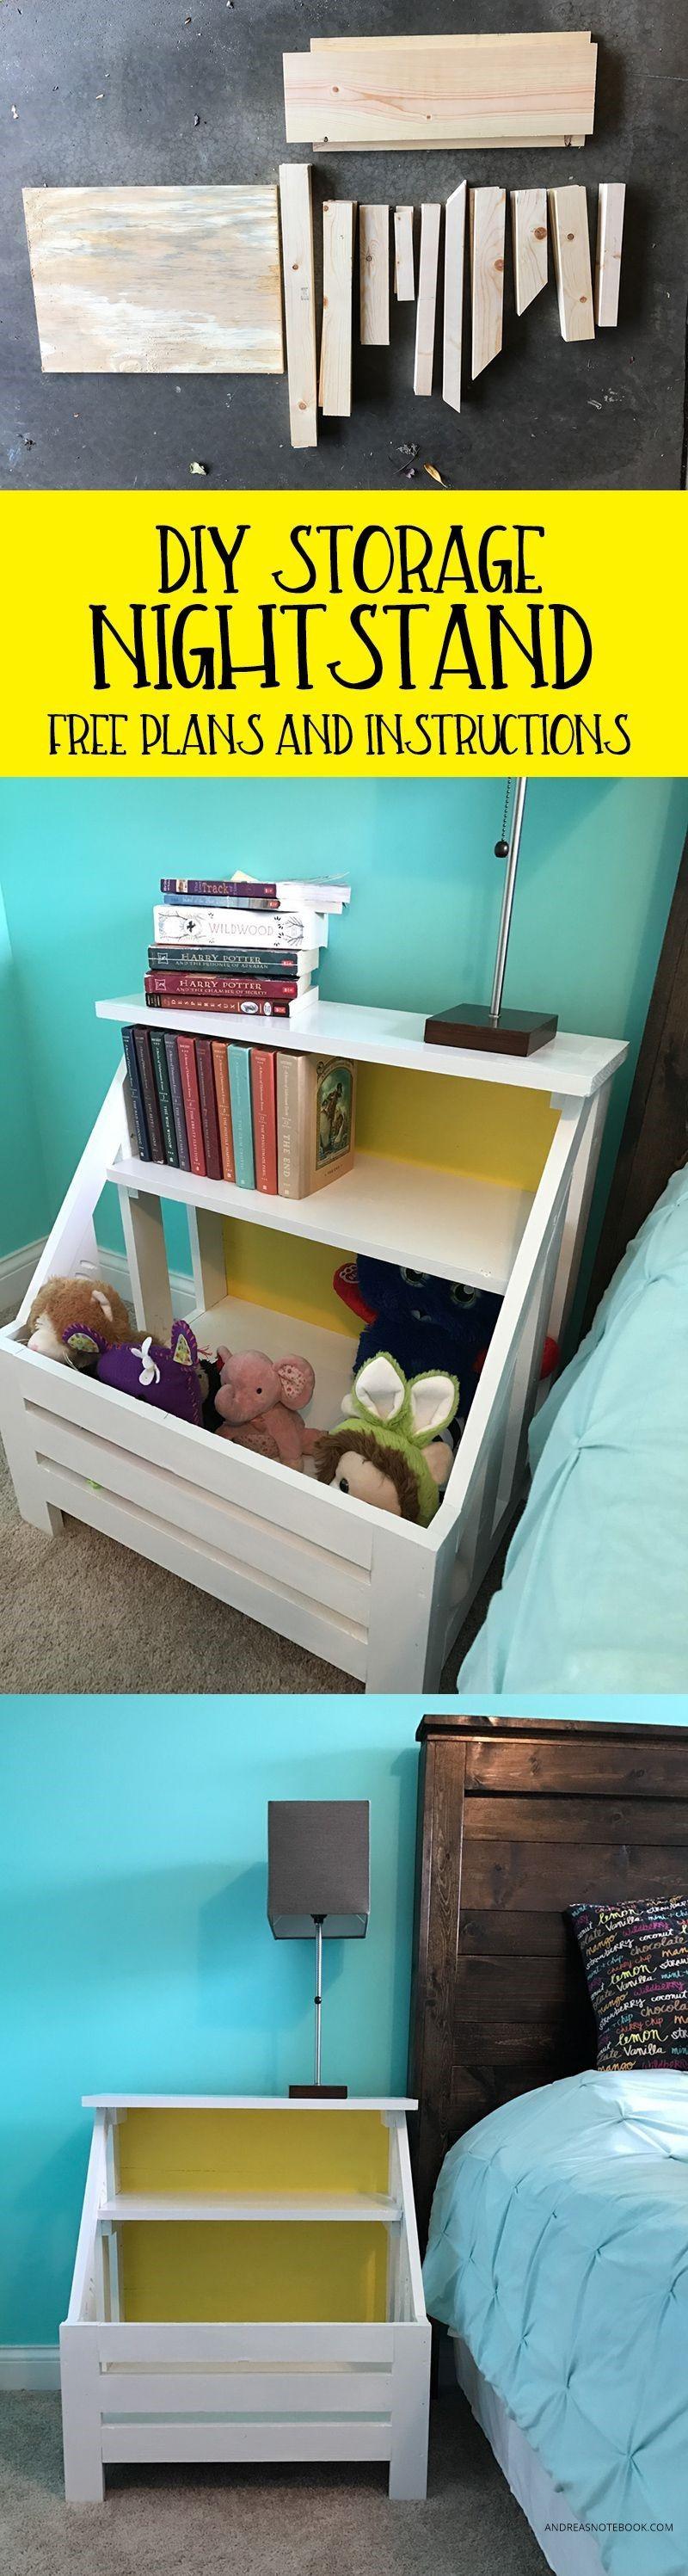 Plans Of Woodworking Diy Projects  Diy Nightstand Free Plans (Diy Bookshelf